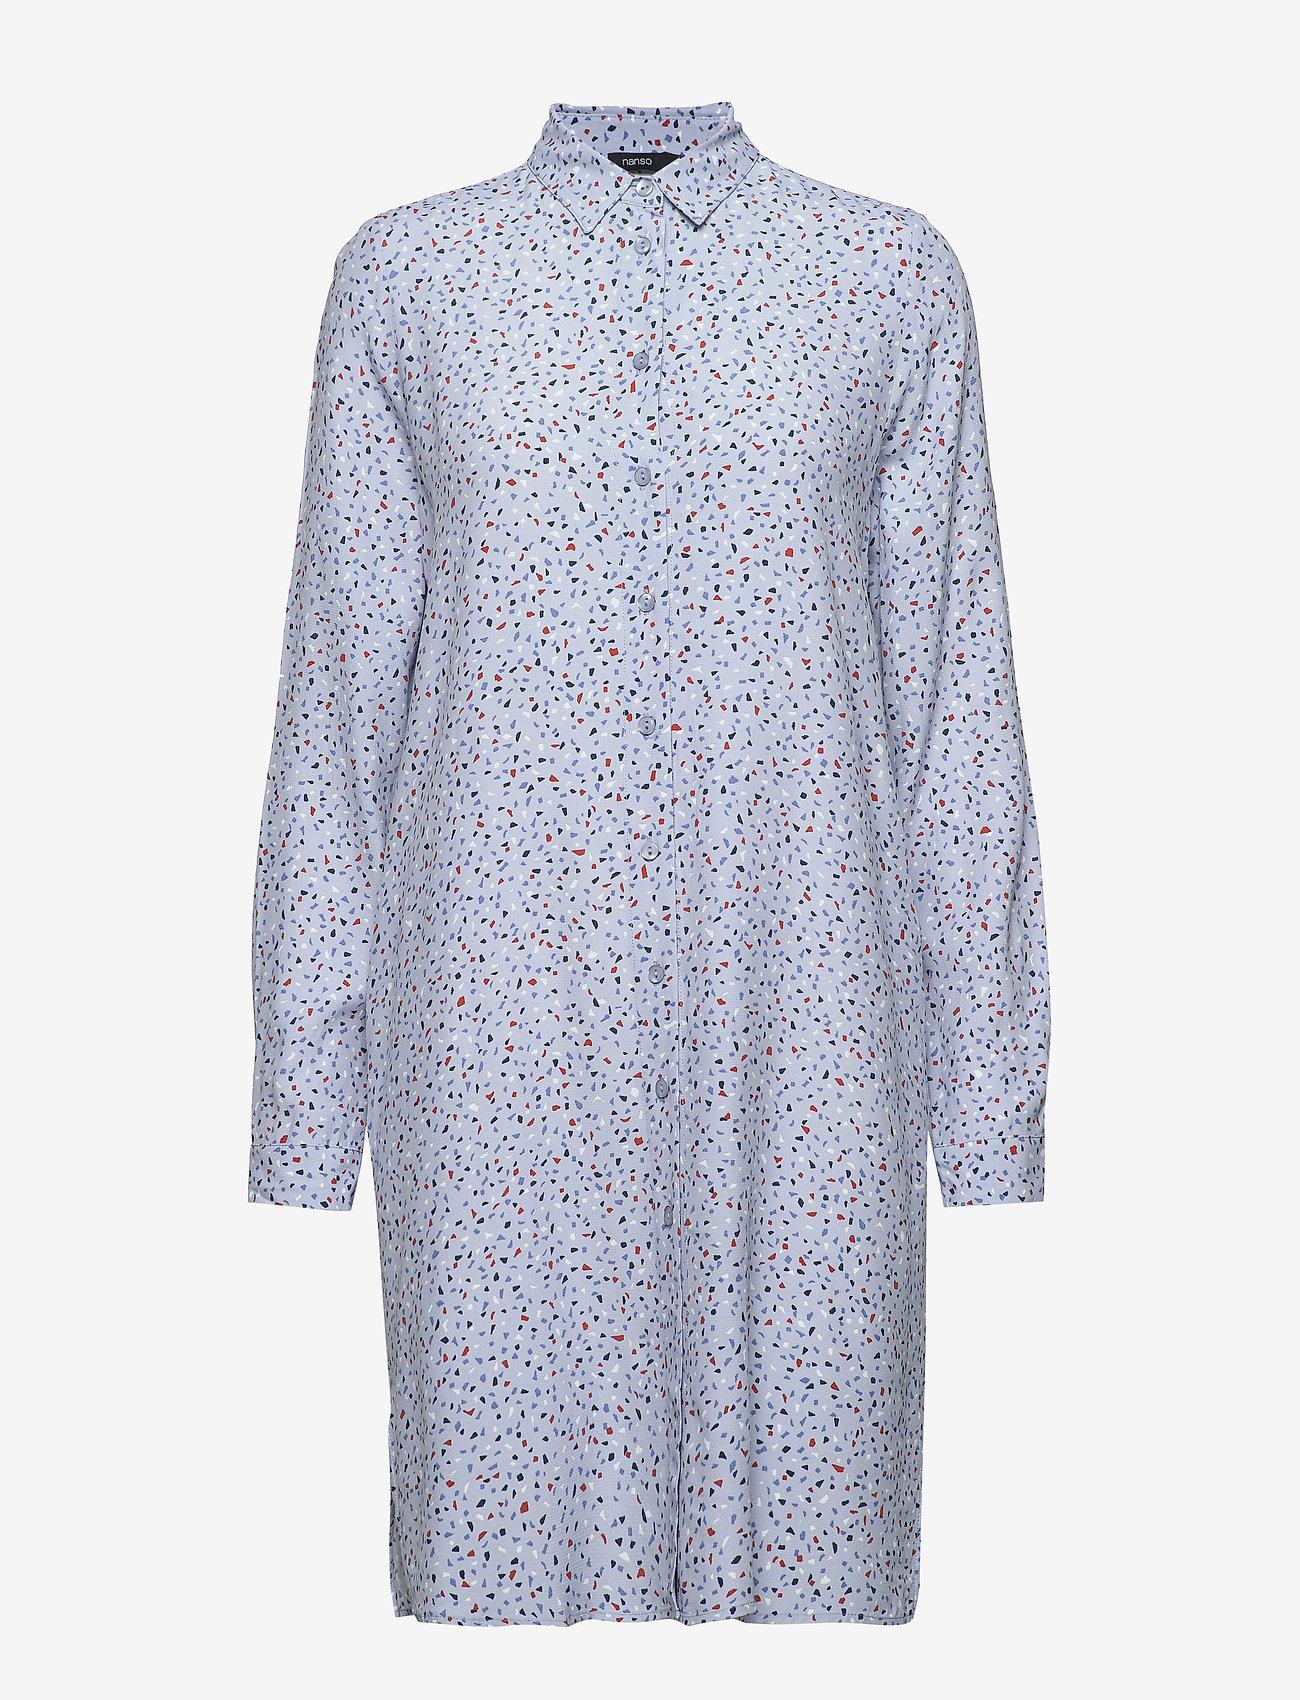 Nanso - Ladies shirt, Siru - robes chemises - grey - 0